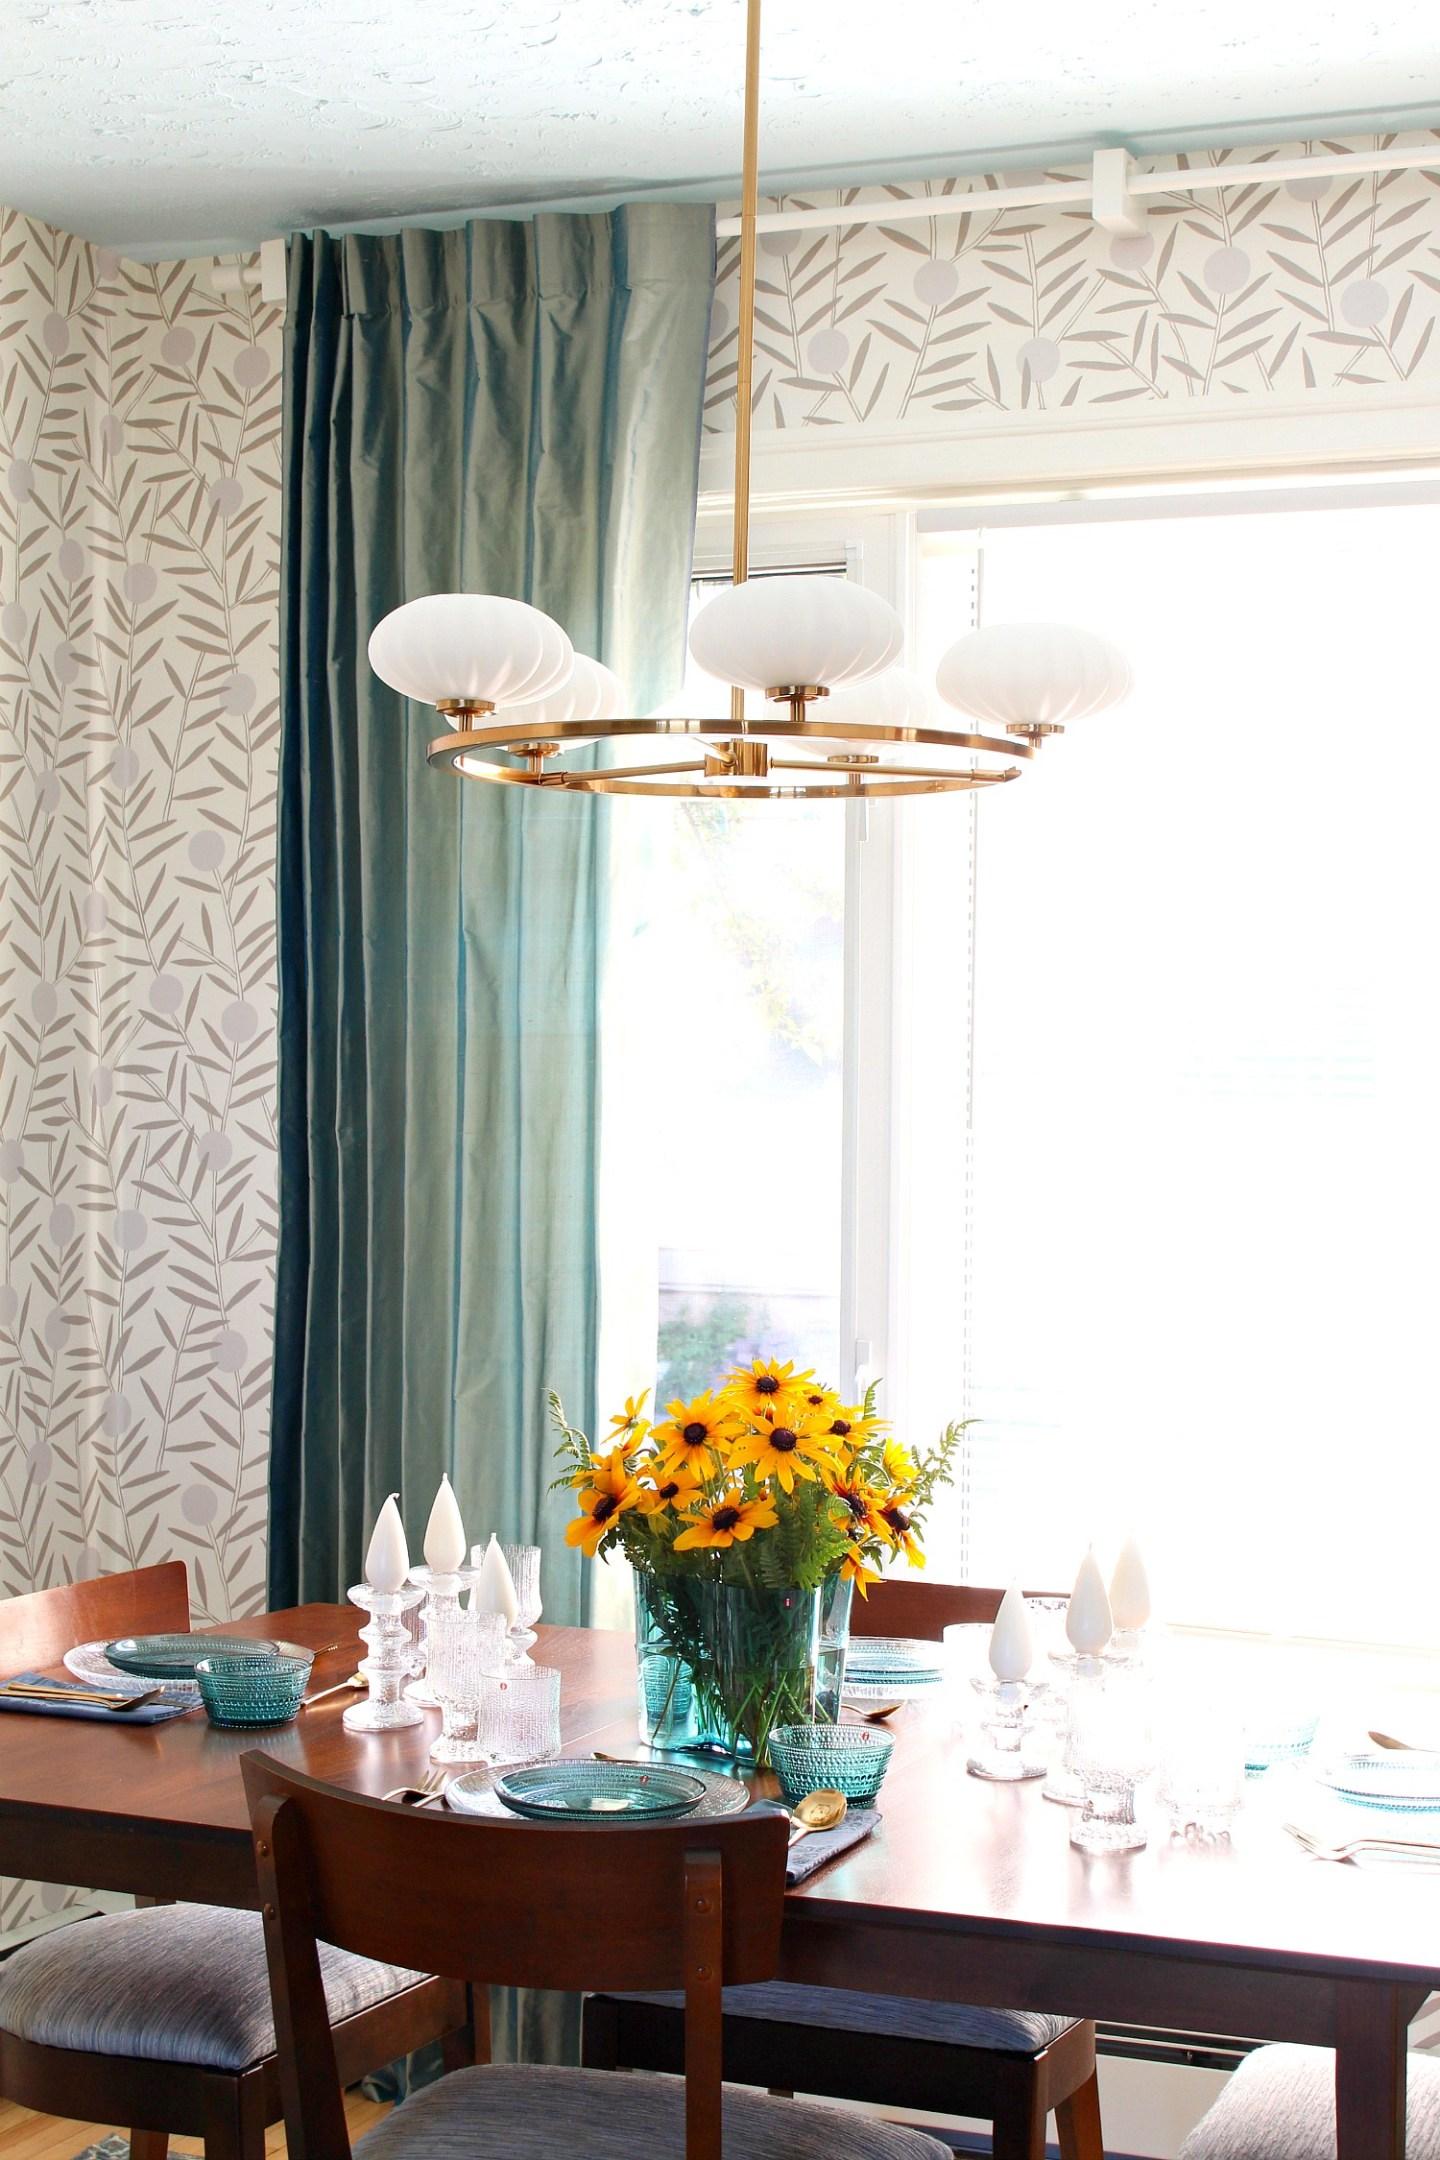 Kichler MCM Style Dining Room Light